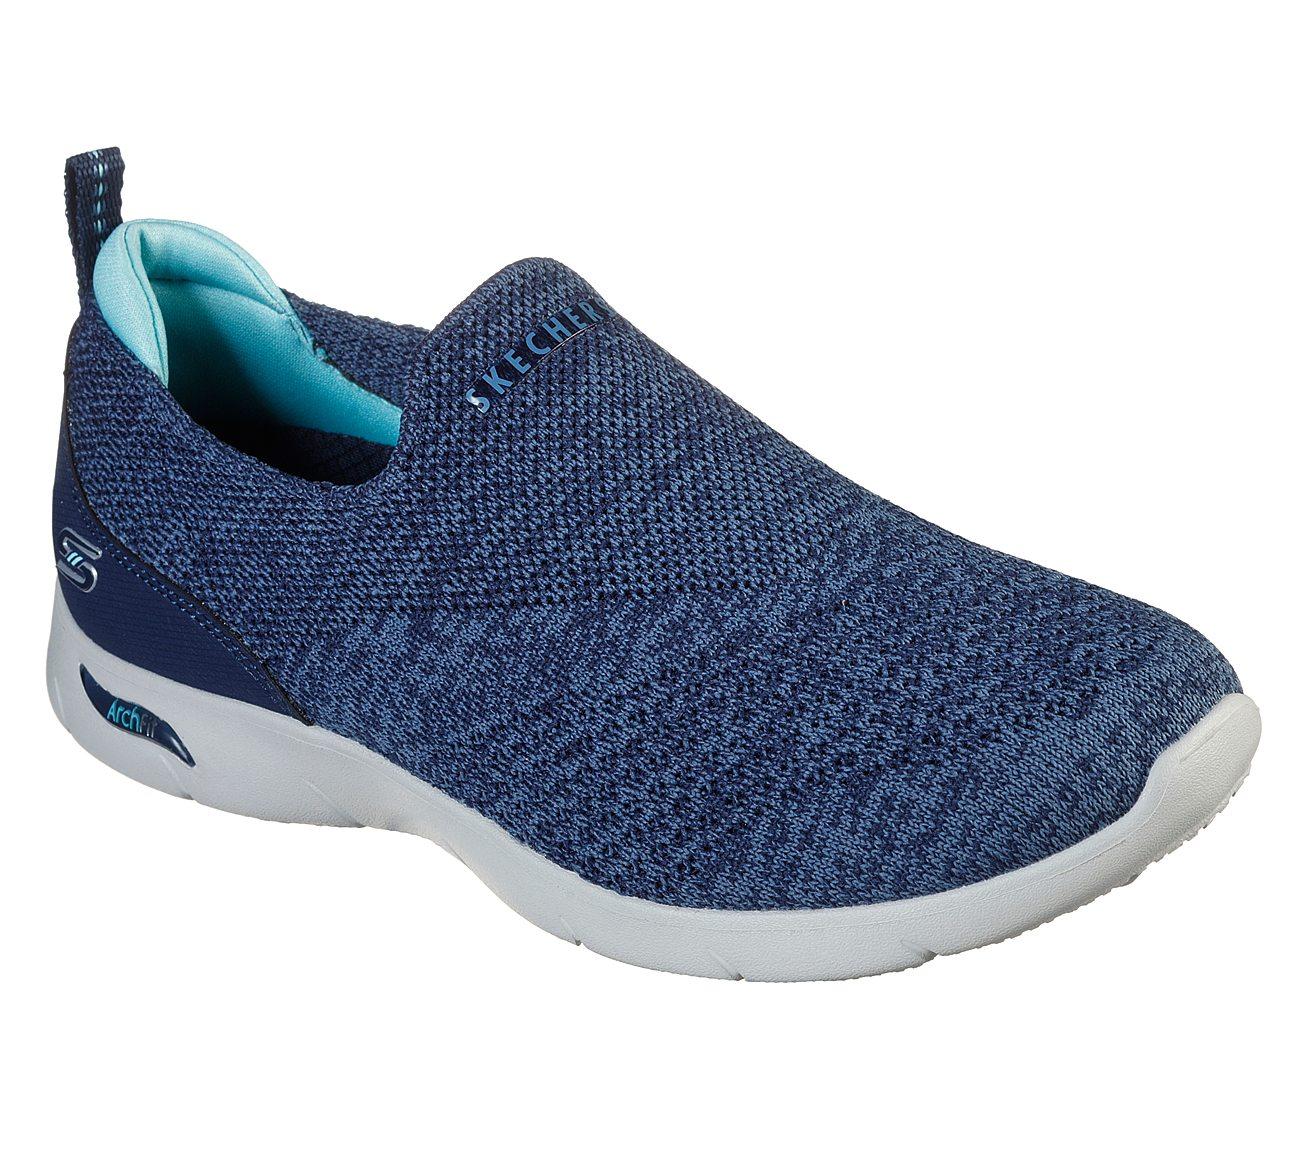 Don't Go Skechers Arch Fit Shoes